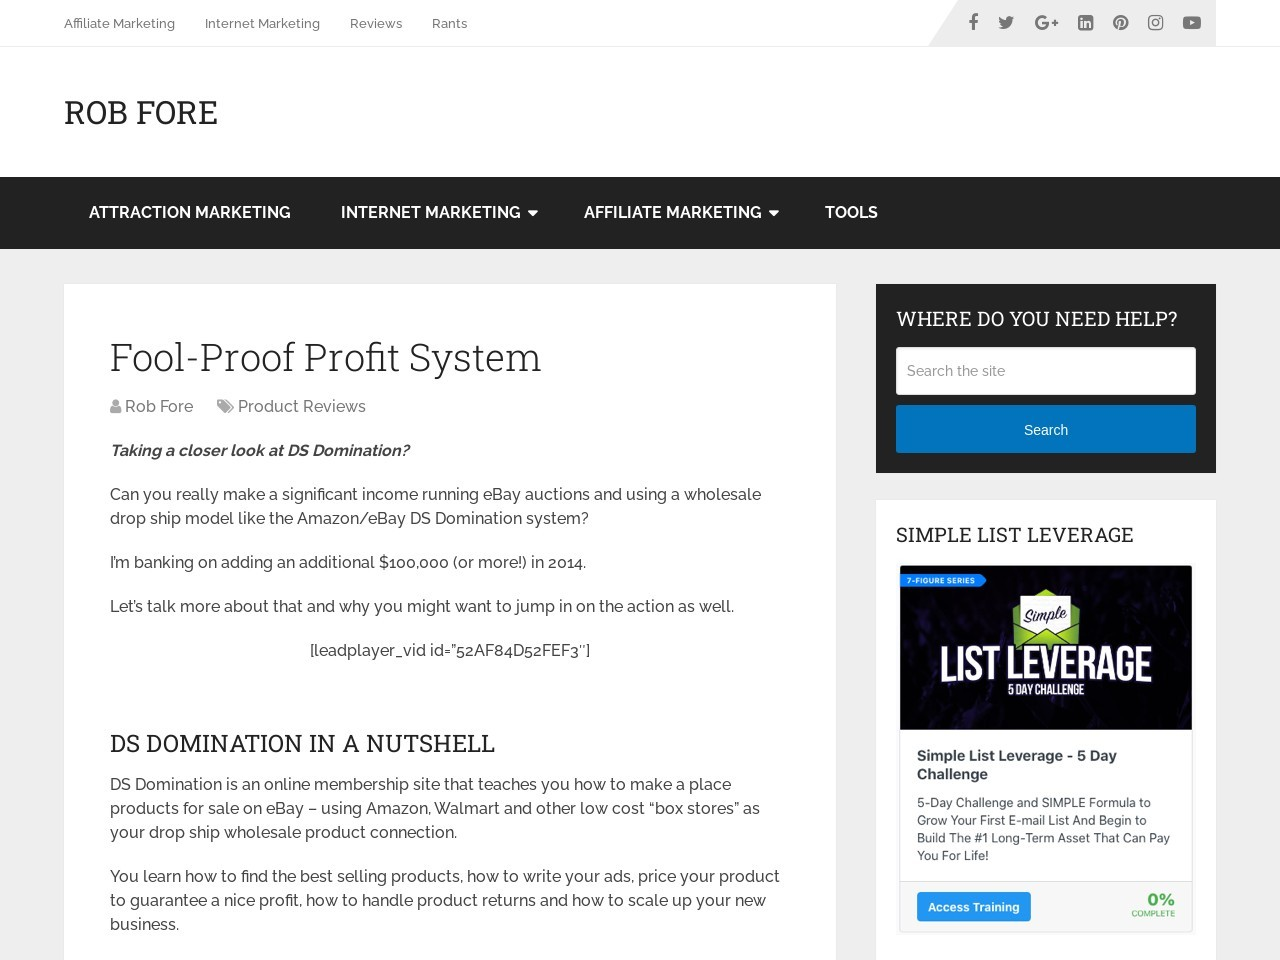 Fool-Proof Profit System